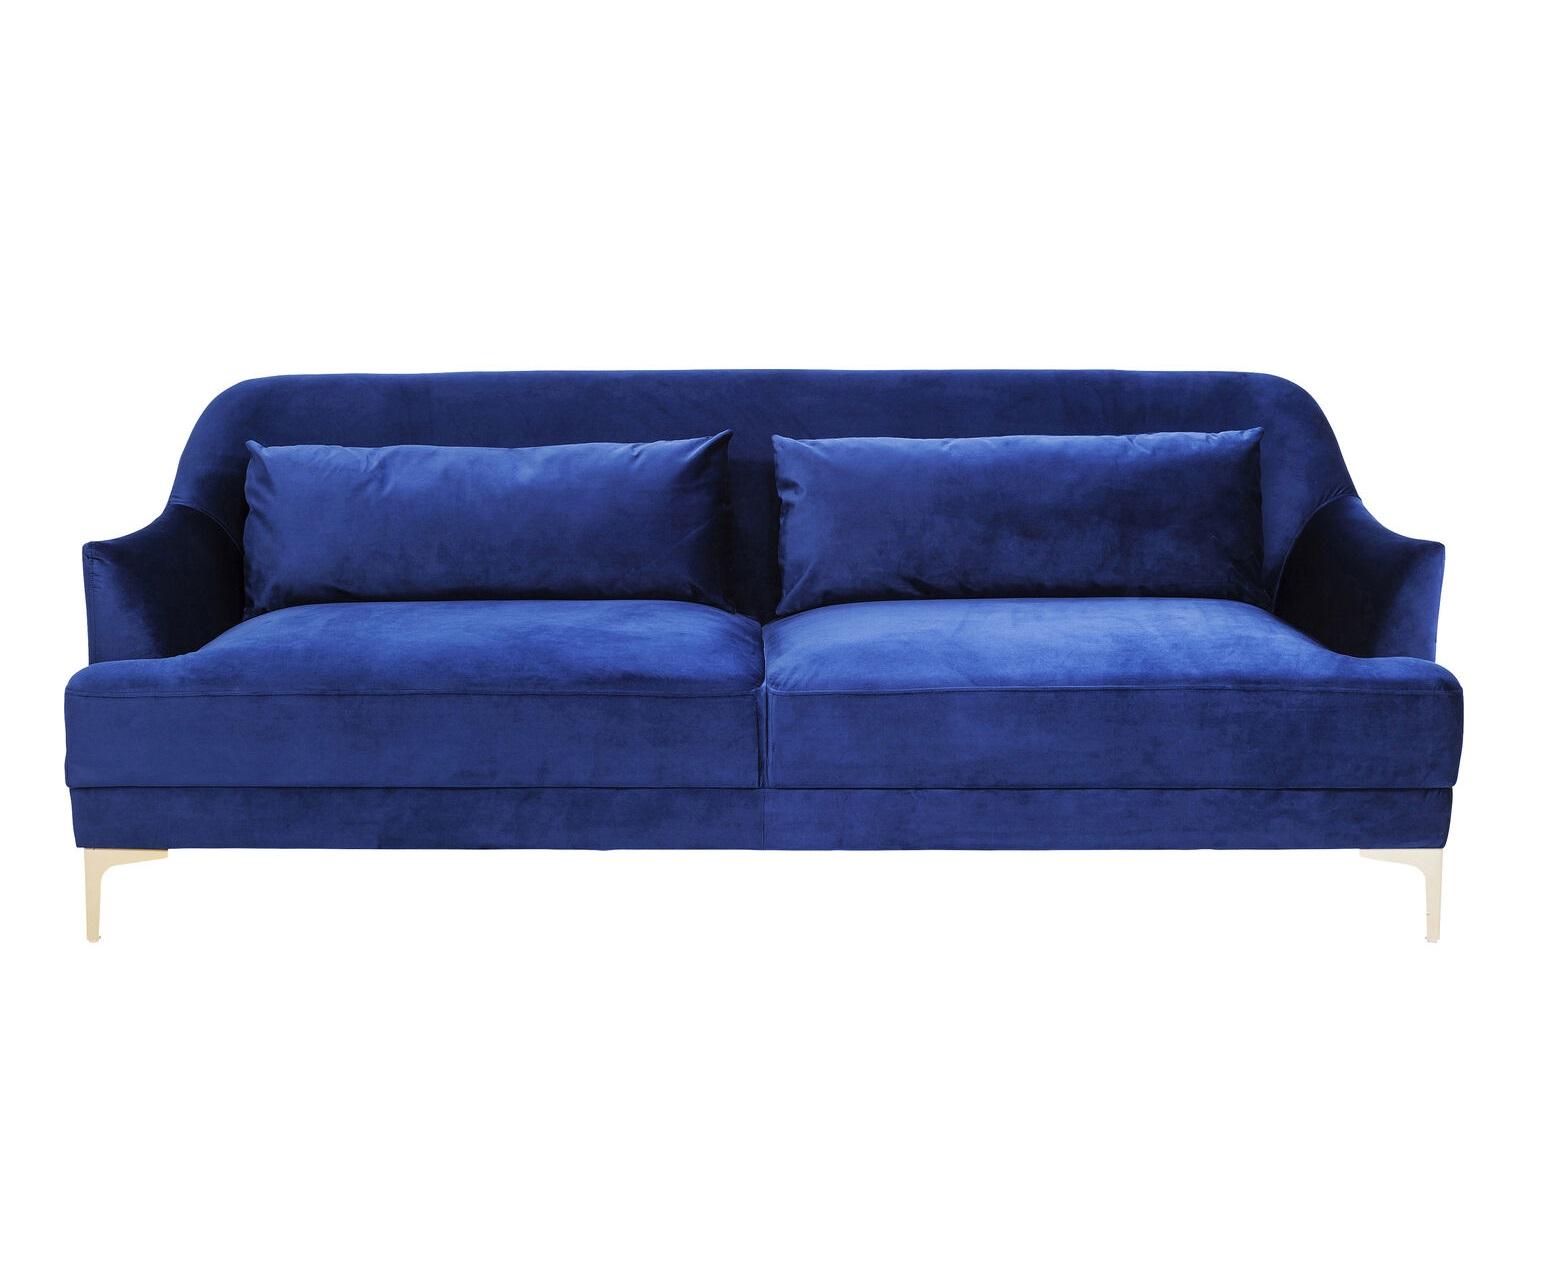 Kare диван proud синий 143339/5